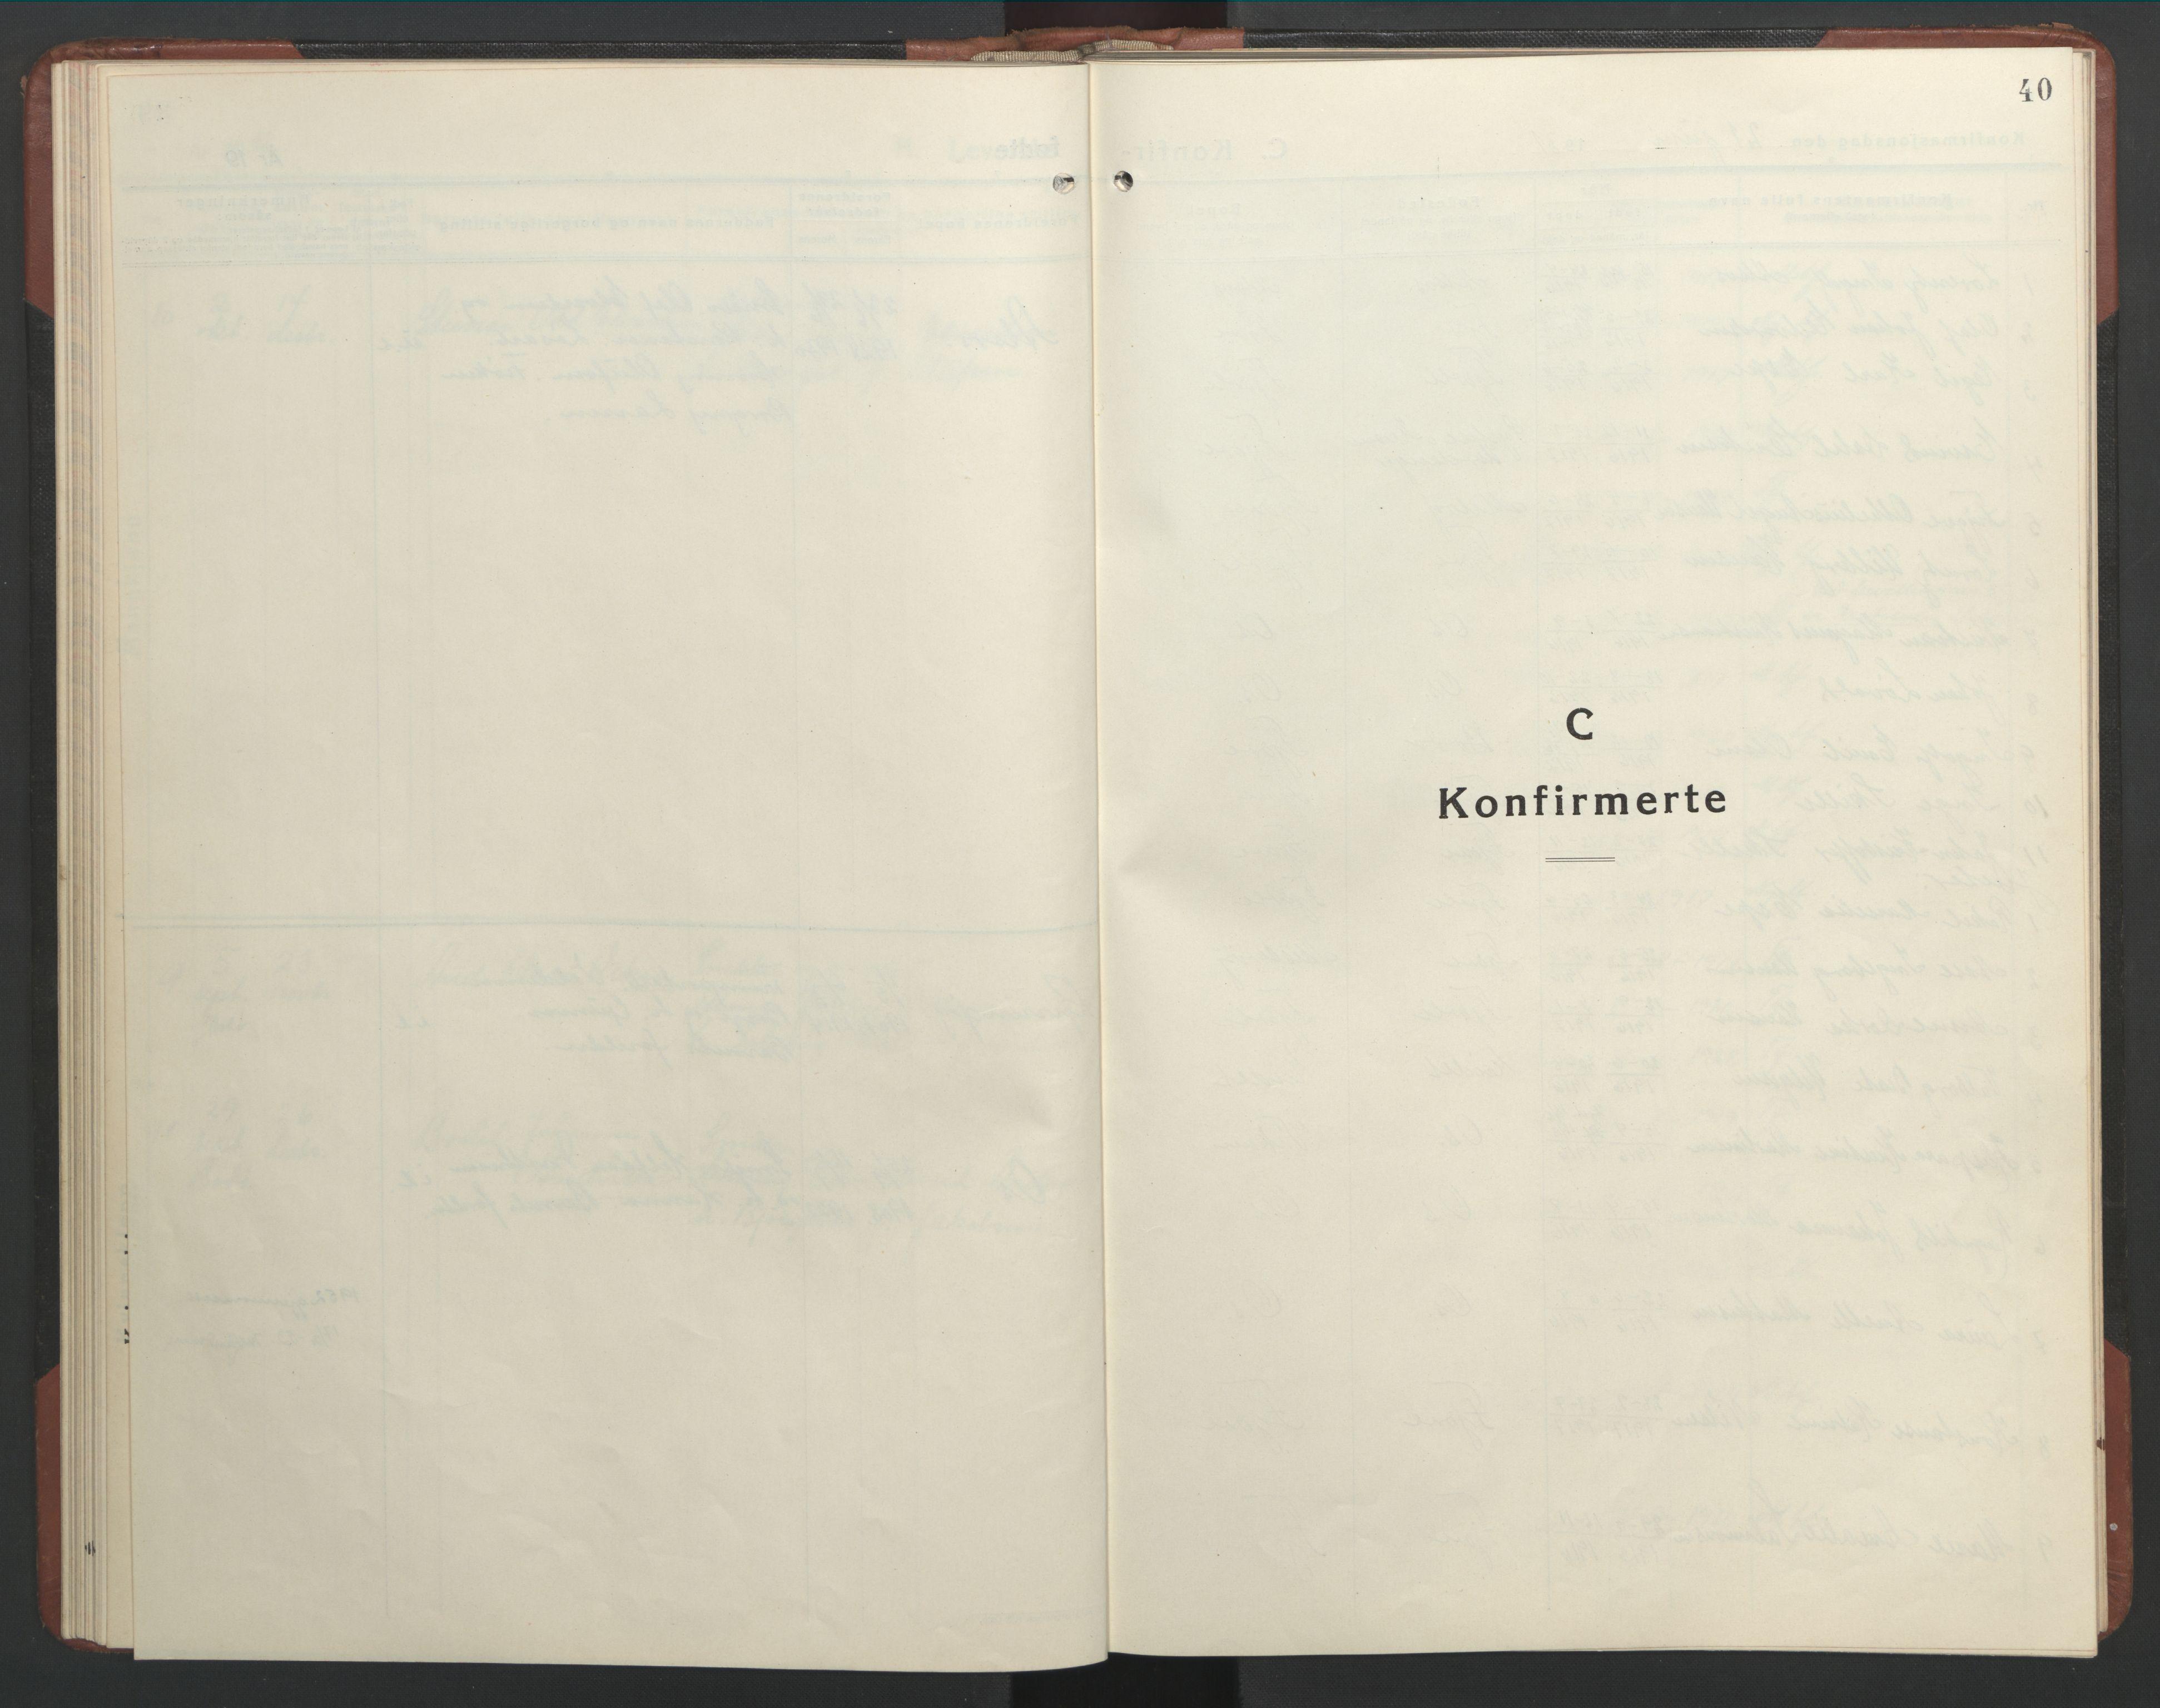 SAT, Ministerialprotokoller, klokkerbøker og fødselsregistre - Nordland, 803/L0078: Klokkerbok nr. 803C05, 1931-1952, s. 40